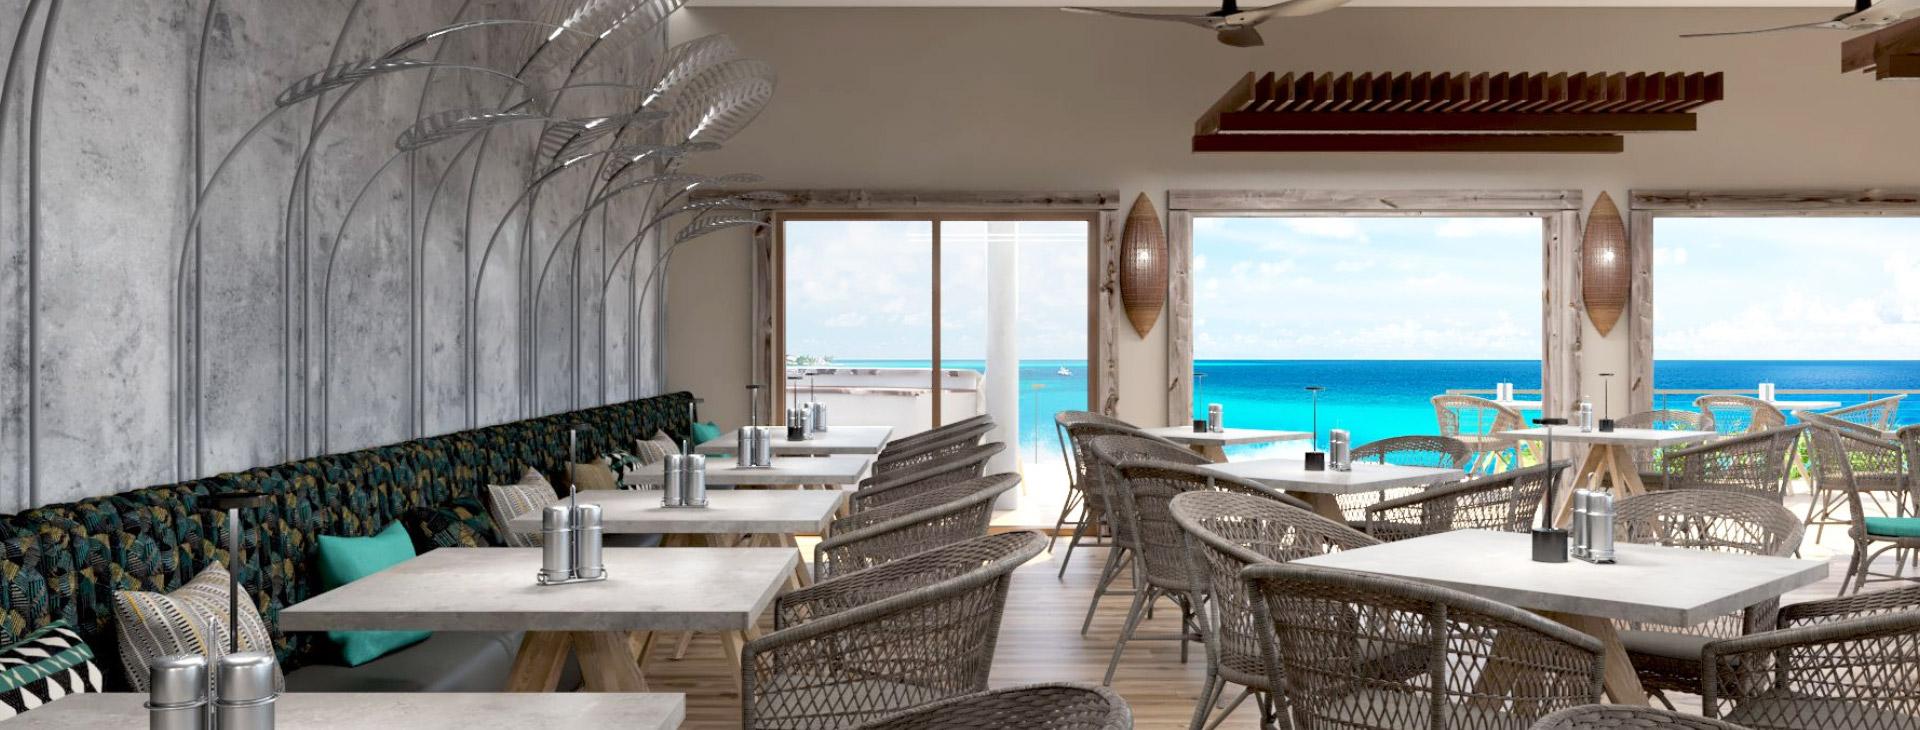 Elements Restaurant Interior